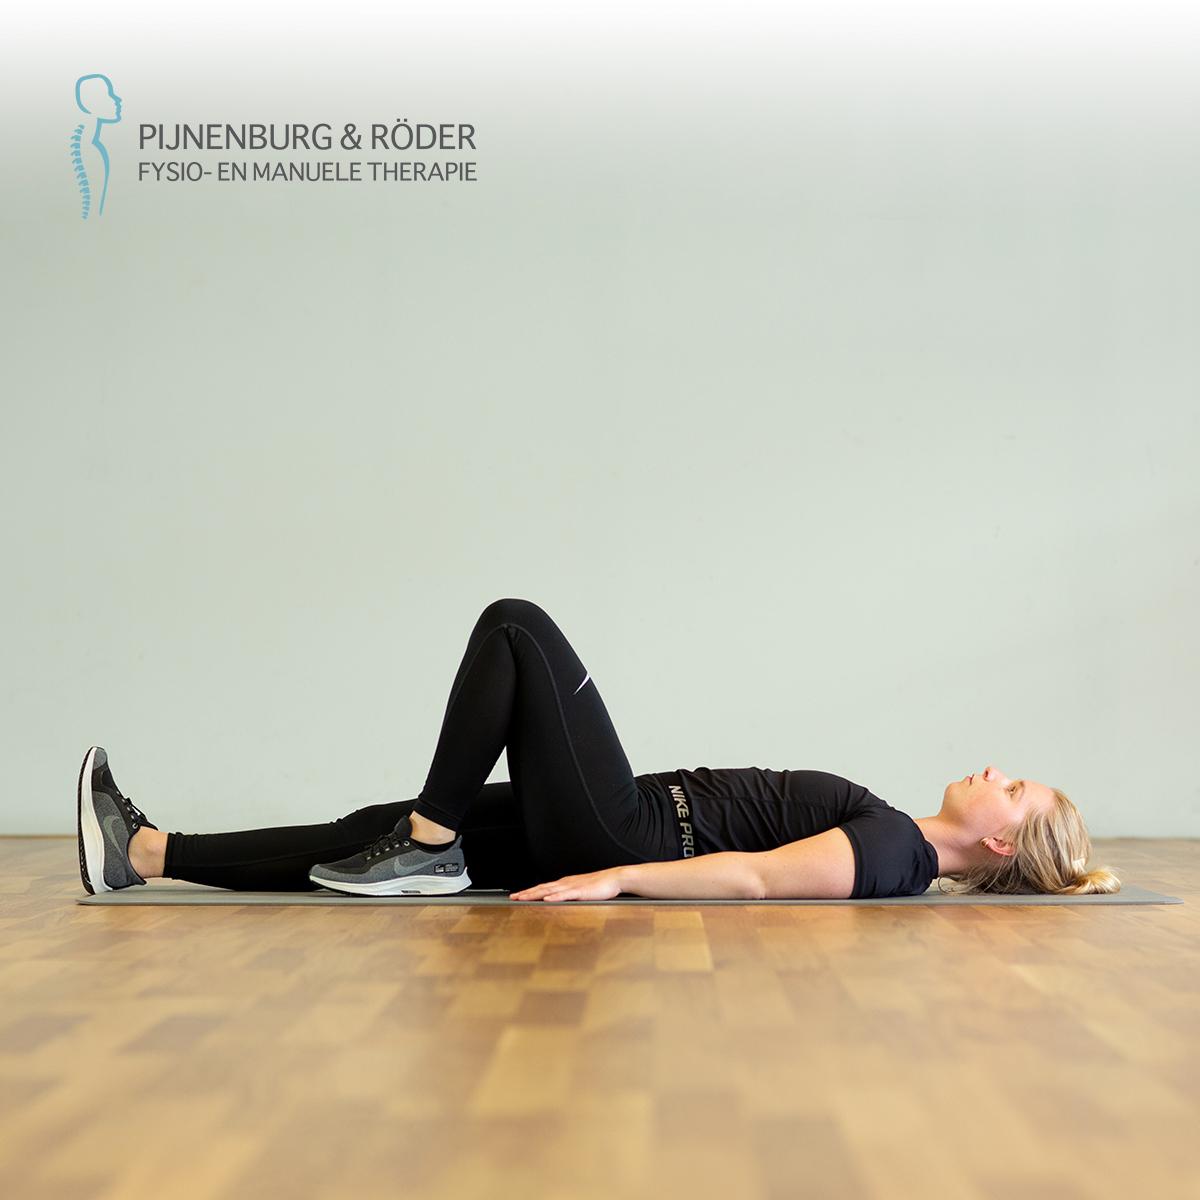 mobiliteit oefening knie flexie